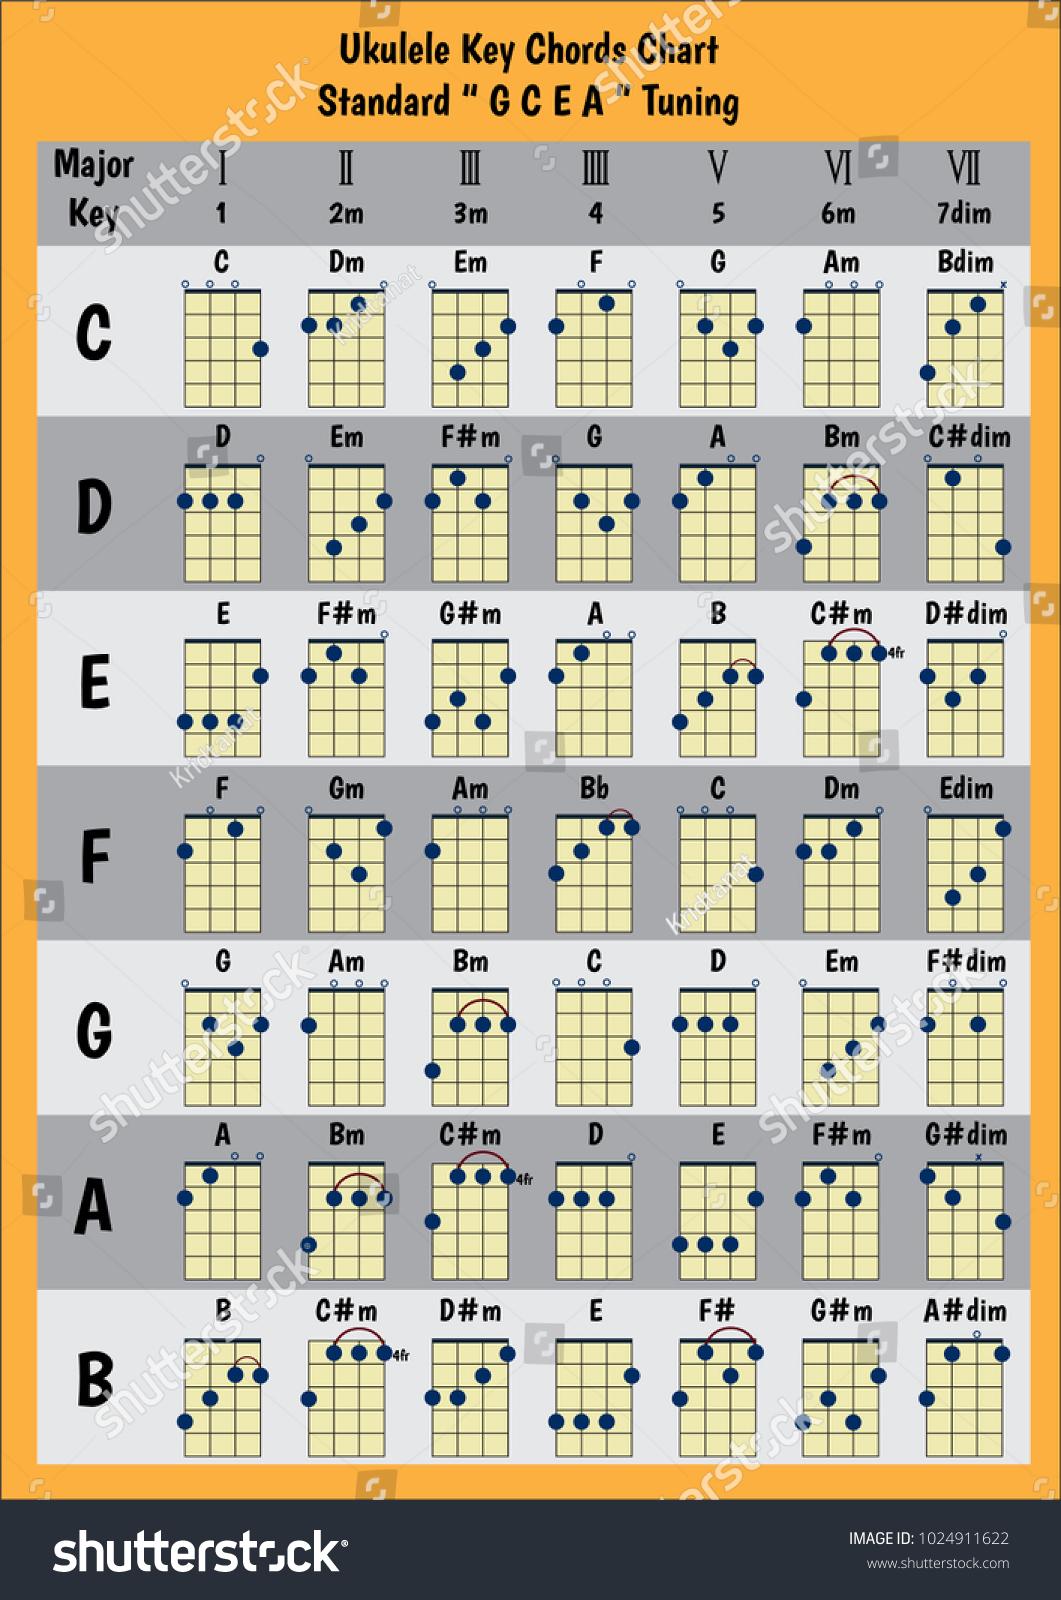 Ukulele Chord Chart Standard Tuning Stock Vector Royalty Diagram Chords A B C D E F G Basic For Beginner Progression